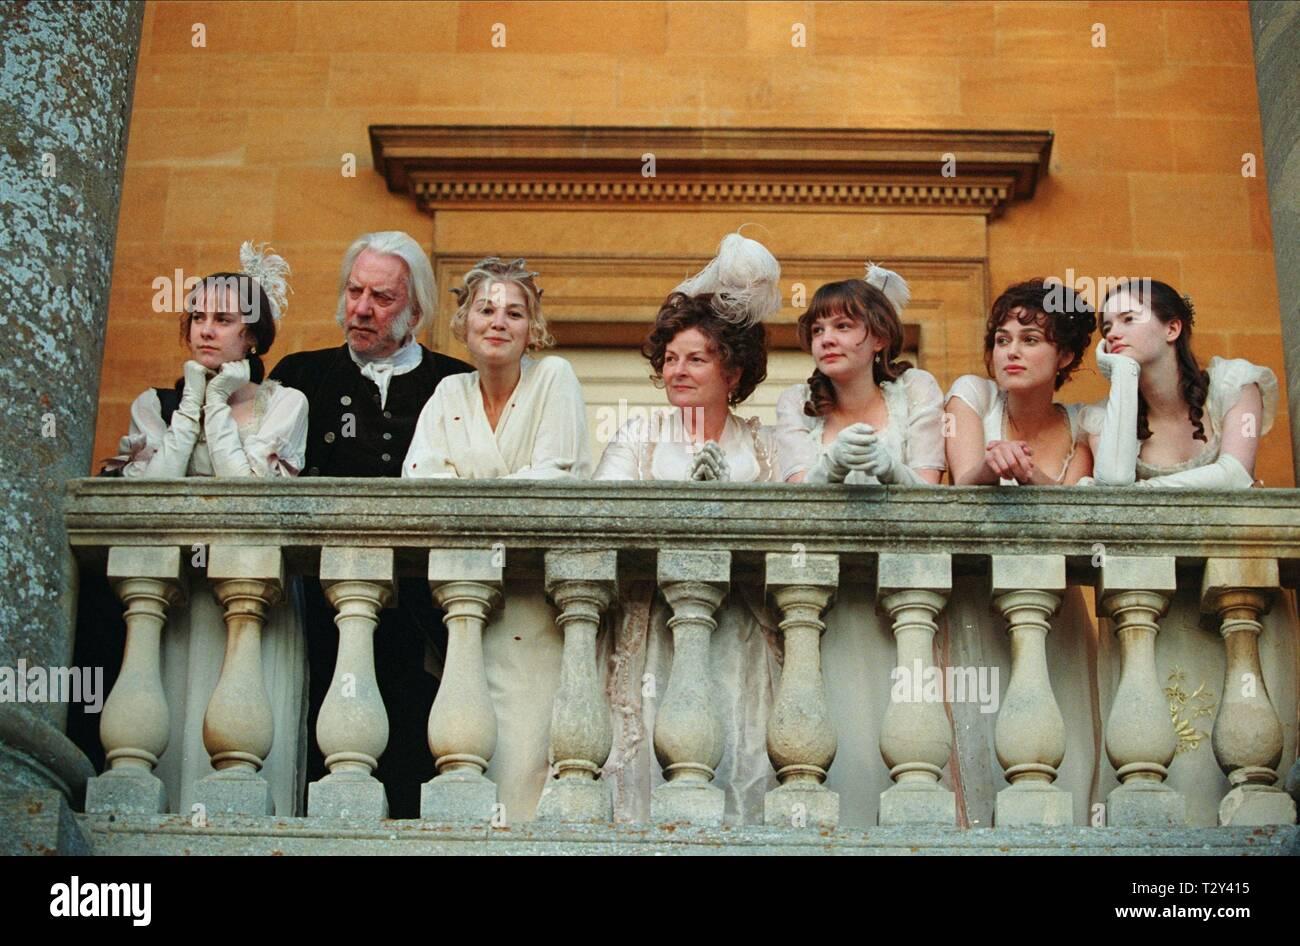 JENA MALONE, DONALD SUTHERLAND, ROSAMUND PIKE, BRENDA BLETHYN, CAREY MULLIGAN, KEIRA KNIGHTLEY, TALULAH RILEY, PRIDE and PREJUDICE, 2005 - Stock Image